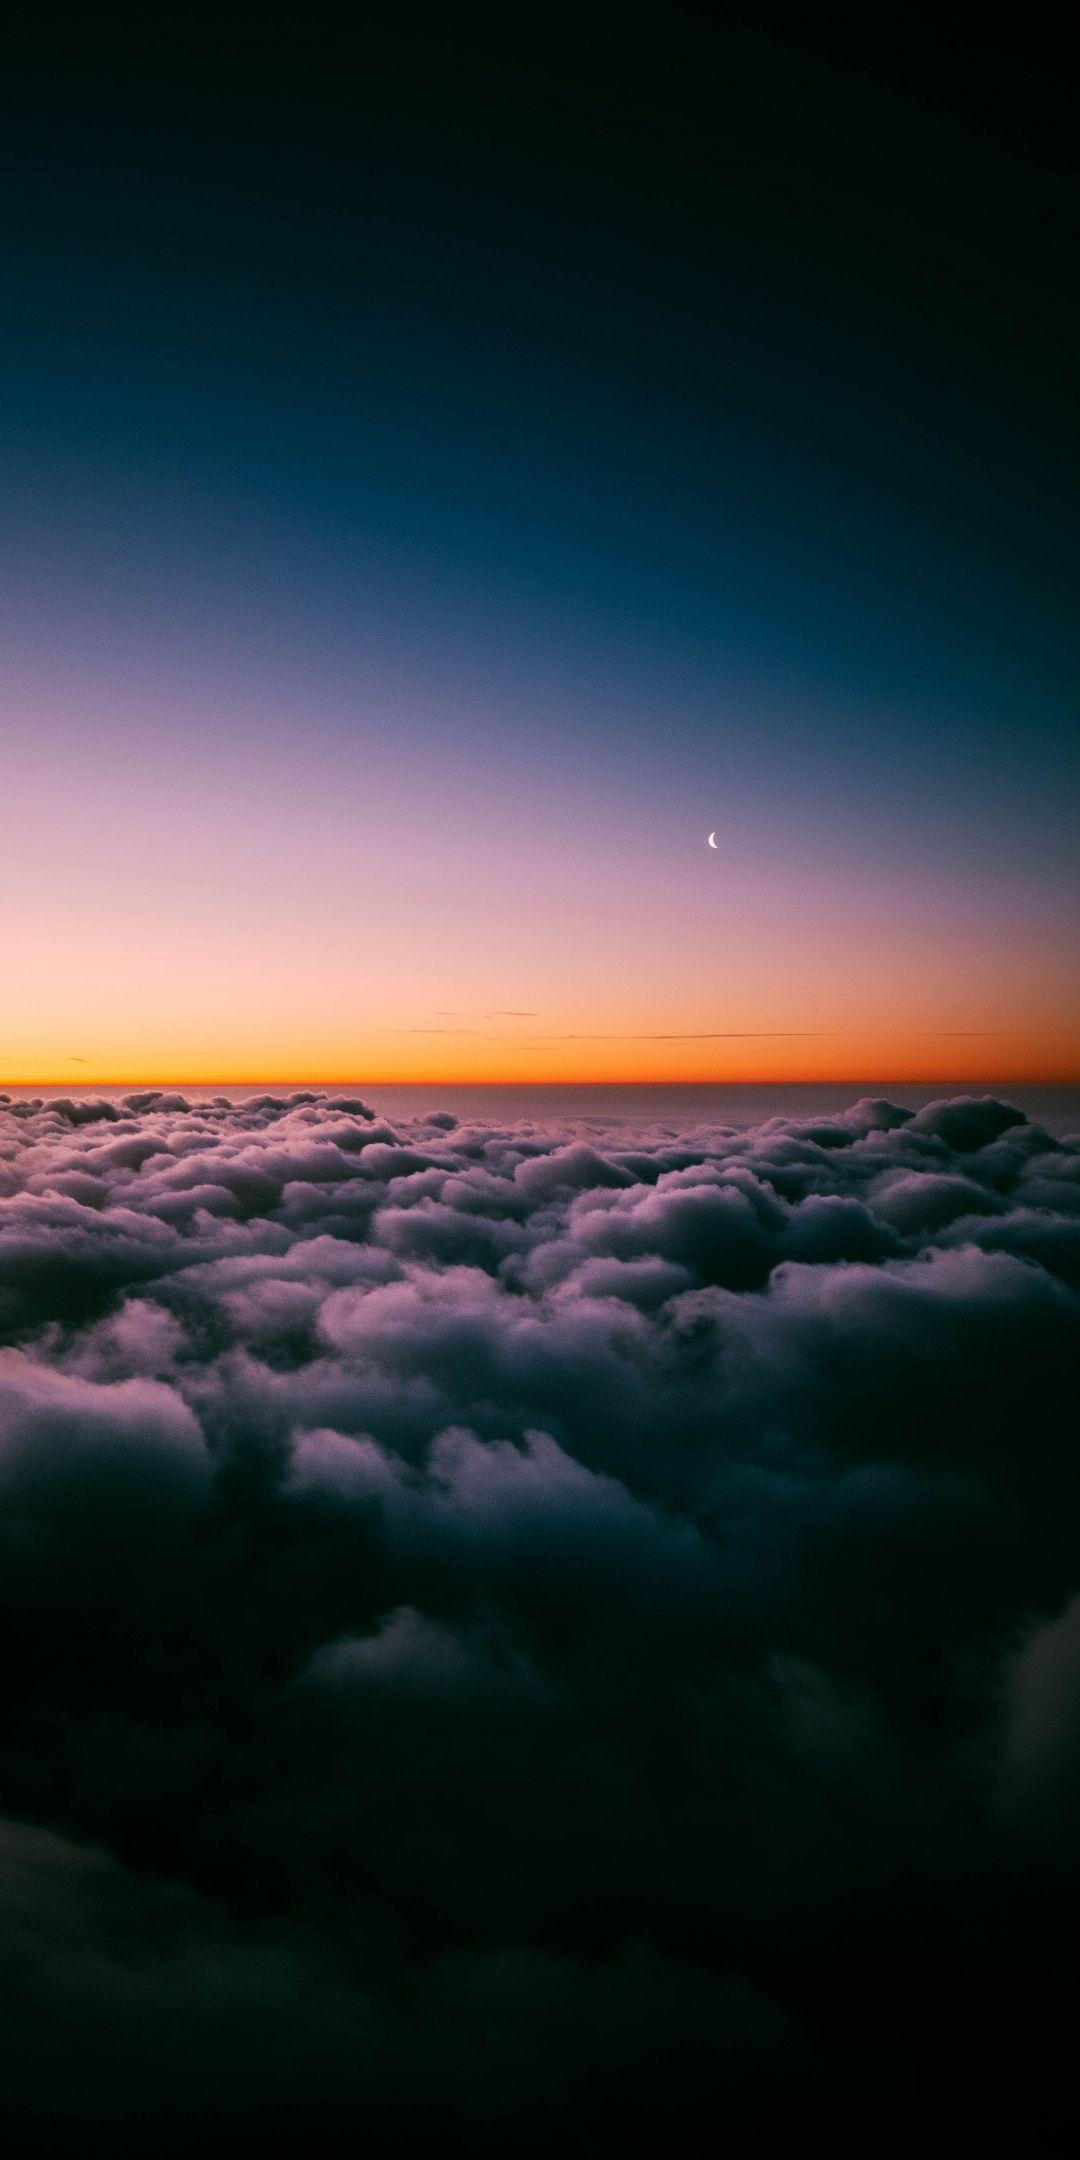 Sky Clouds Horizon Twilight Wallpaper Night Sky Wallpaper Scenery Wallpaper Cloud Wallpaper Hd wallpaper sky clouds sunset dusk